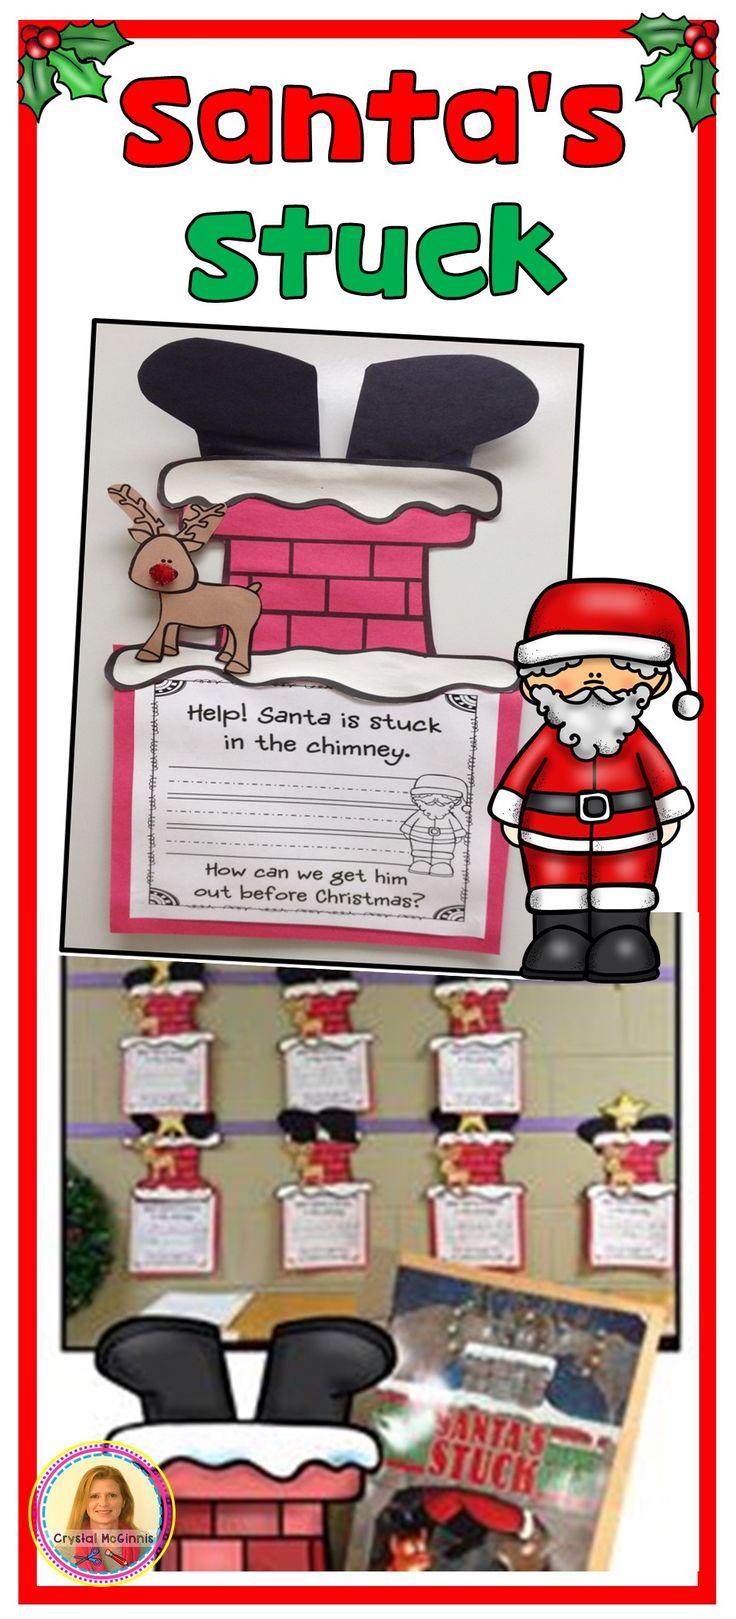 Santa's Stuck Christmas Craft